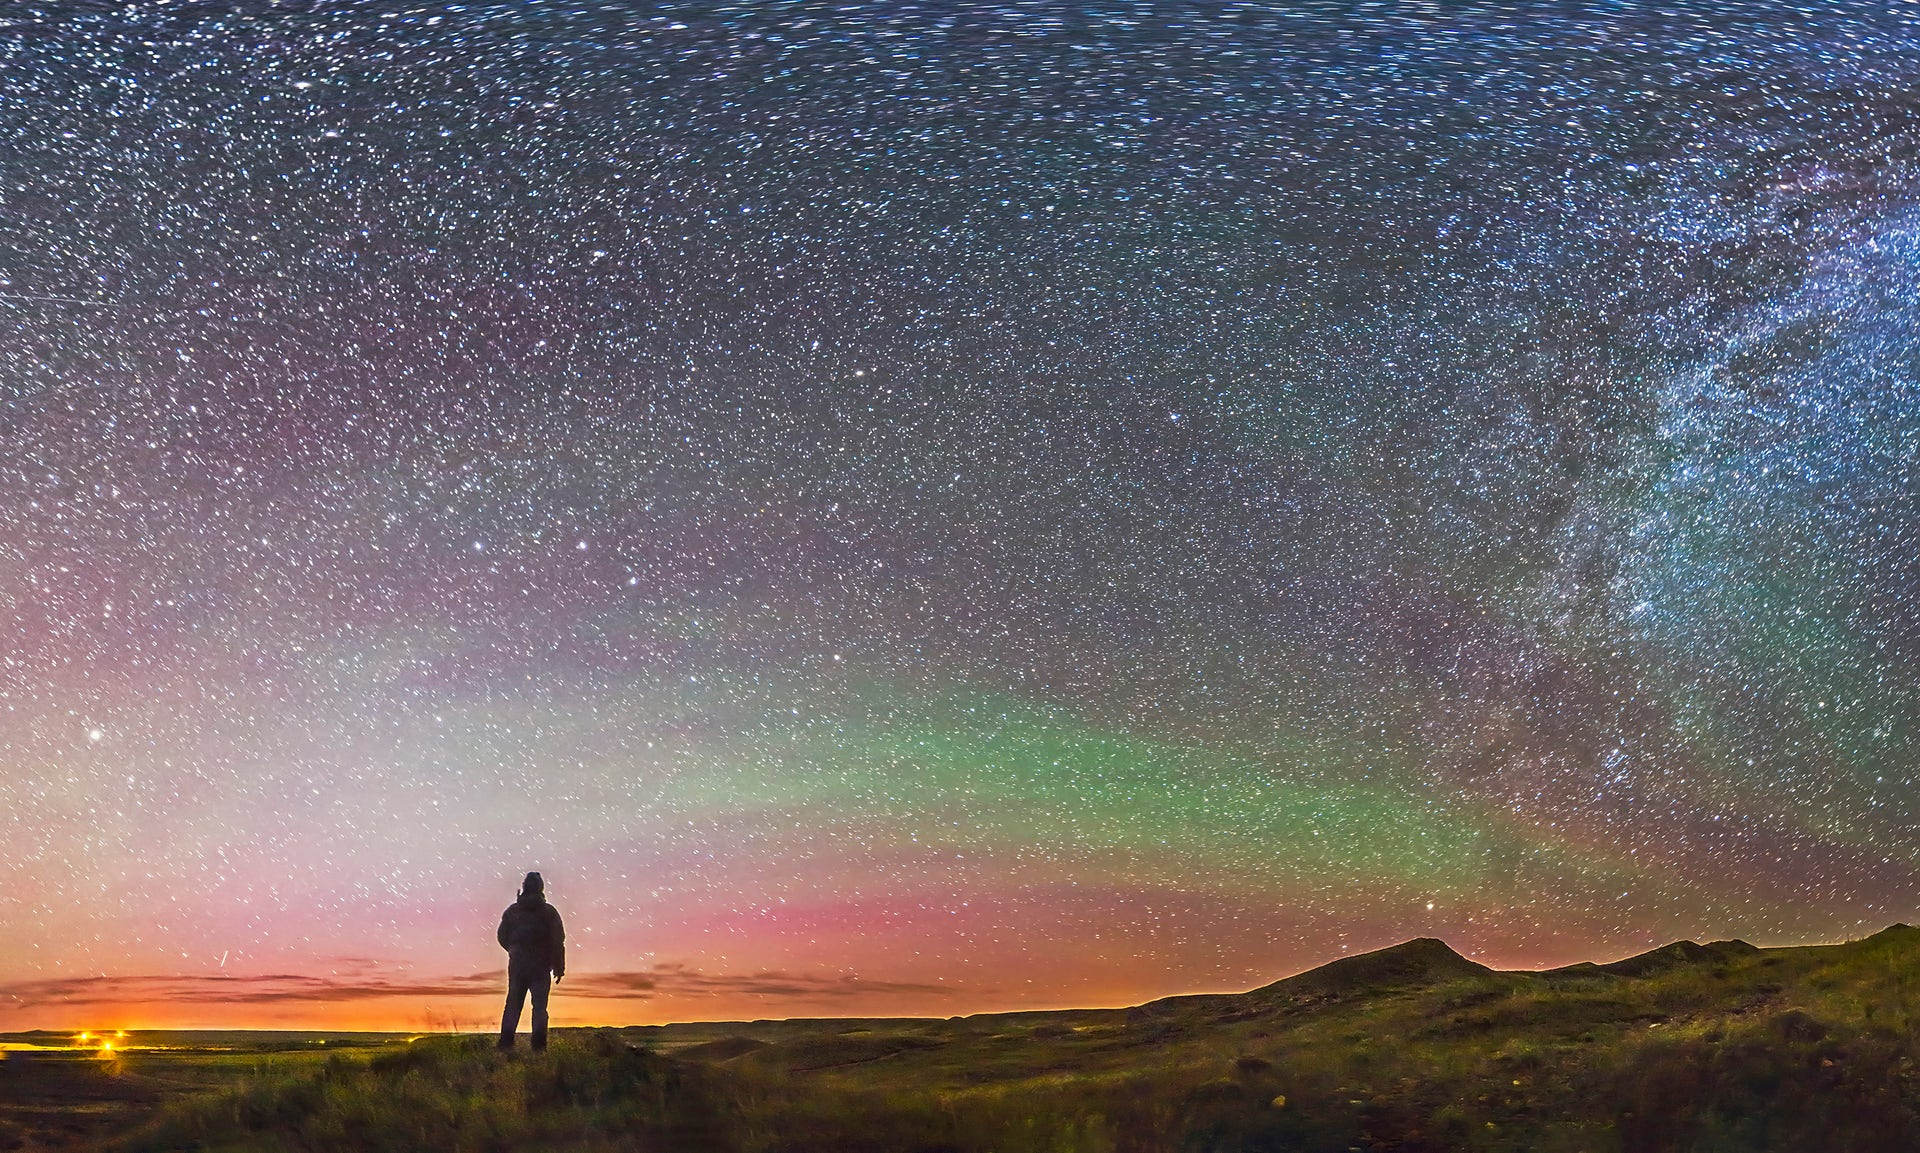 Bright nights: scientists explain rare phenomenon of 'nocturnal sun', bight night, nocturnal sun, mysterious bright night phenomenon explained